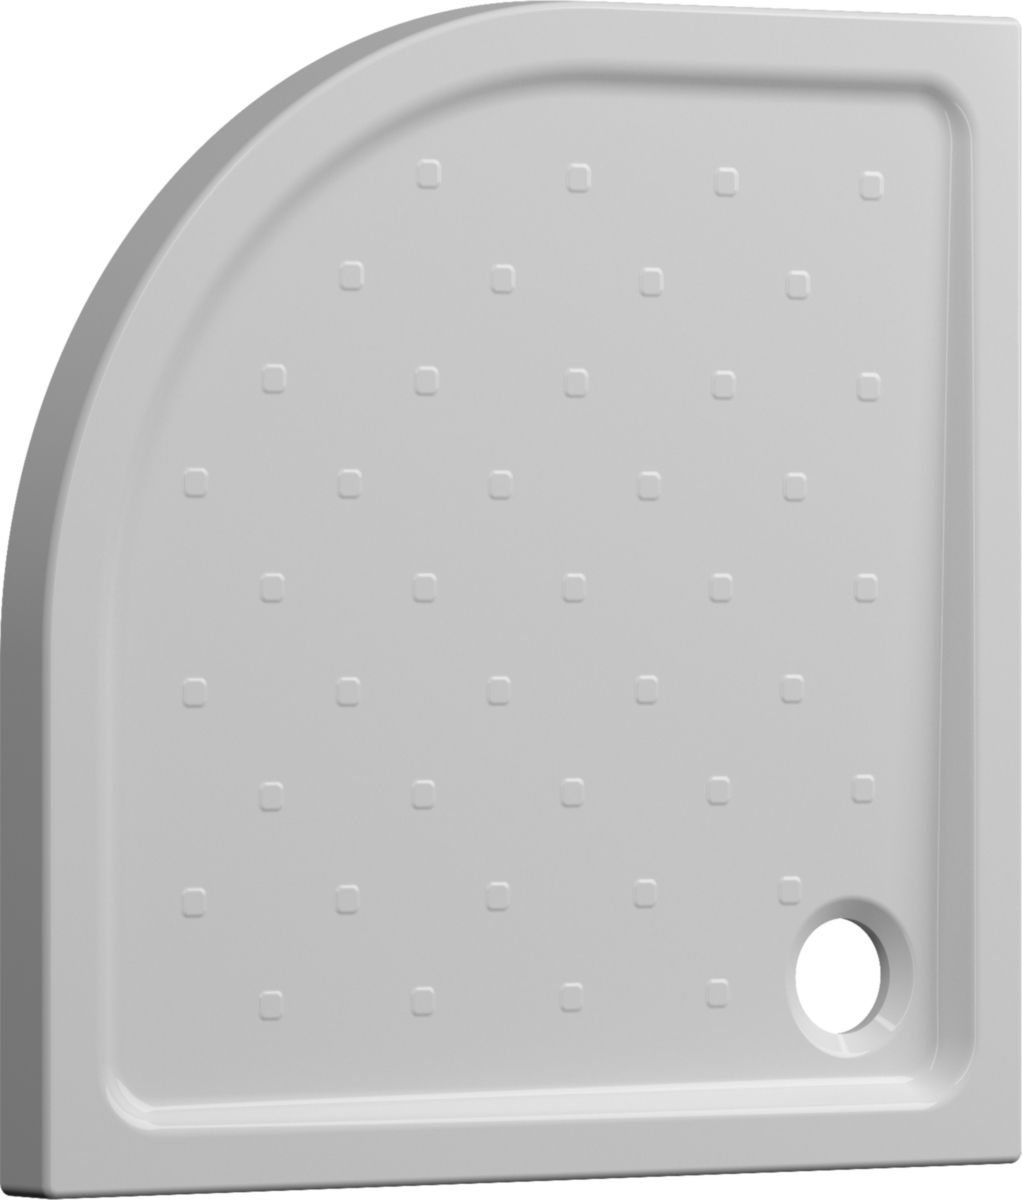 Receveur A Poser Seducta 2 Extraplat Angle 90 X 90 Blanc Receveur Blanc Sanitaire